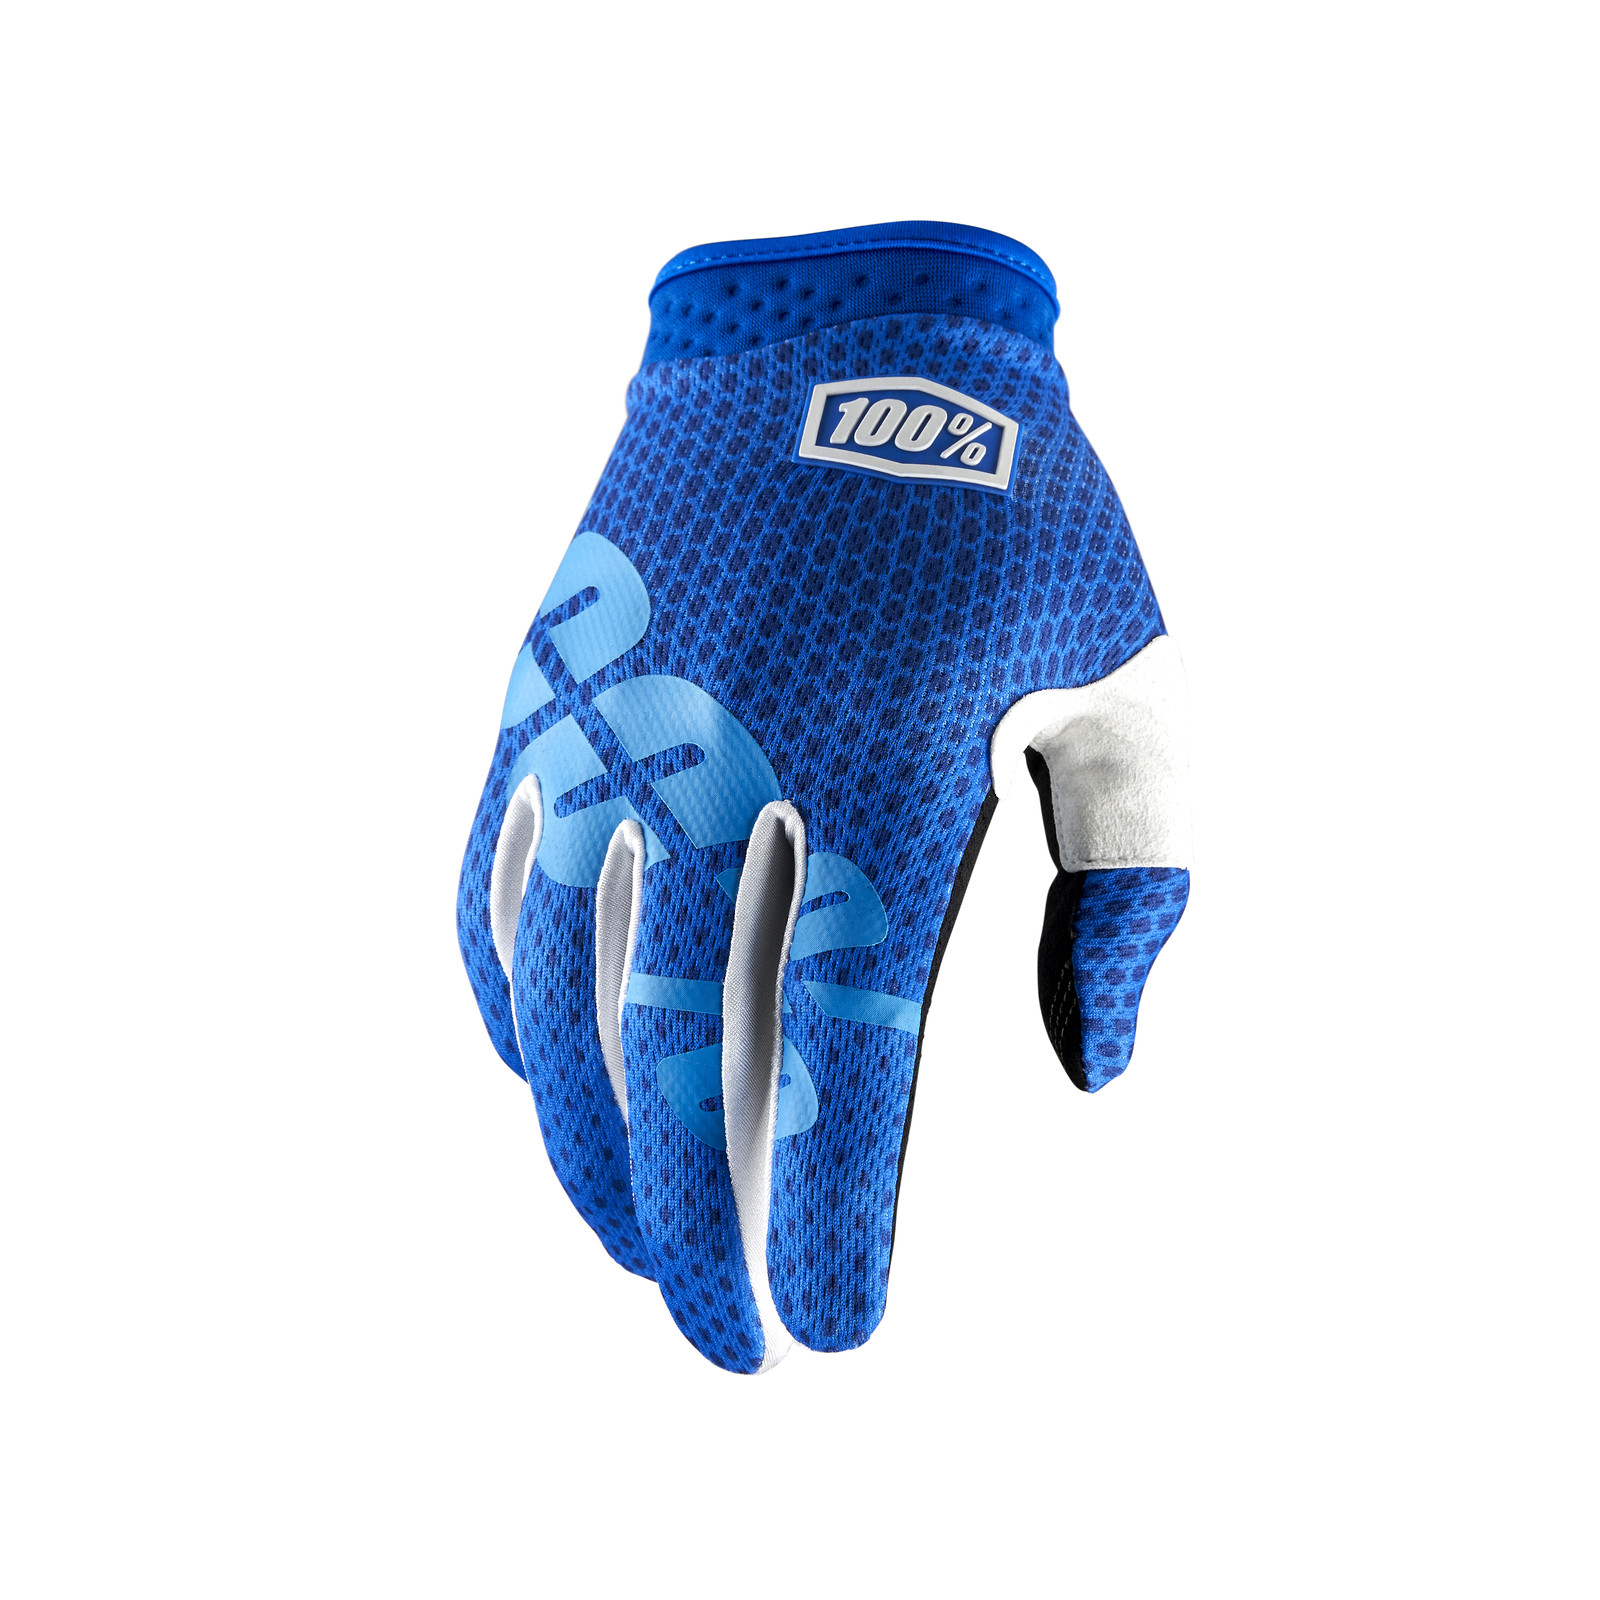 iTrack Glove - Blue - 100percent - Motocross Pictures - Vital MX